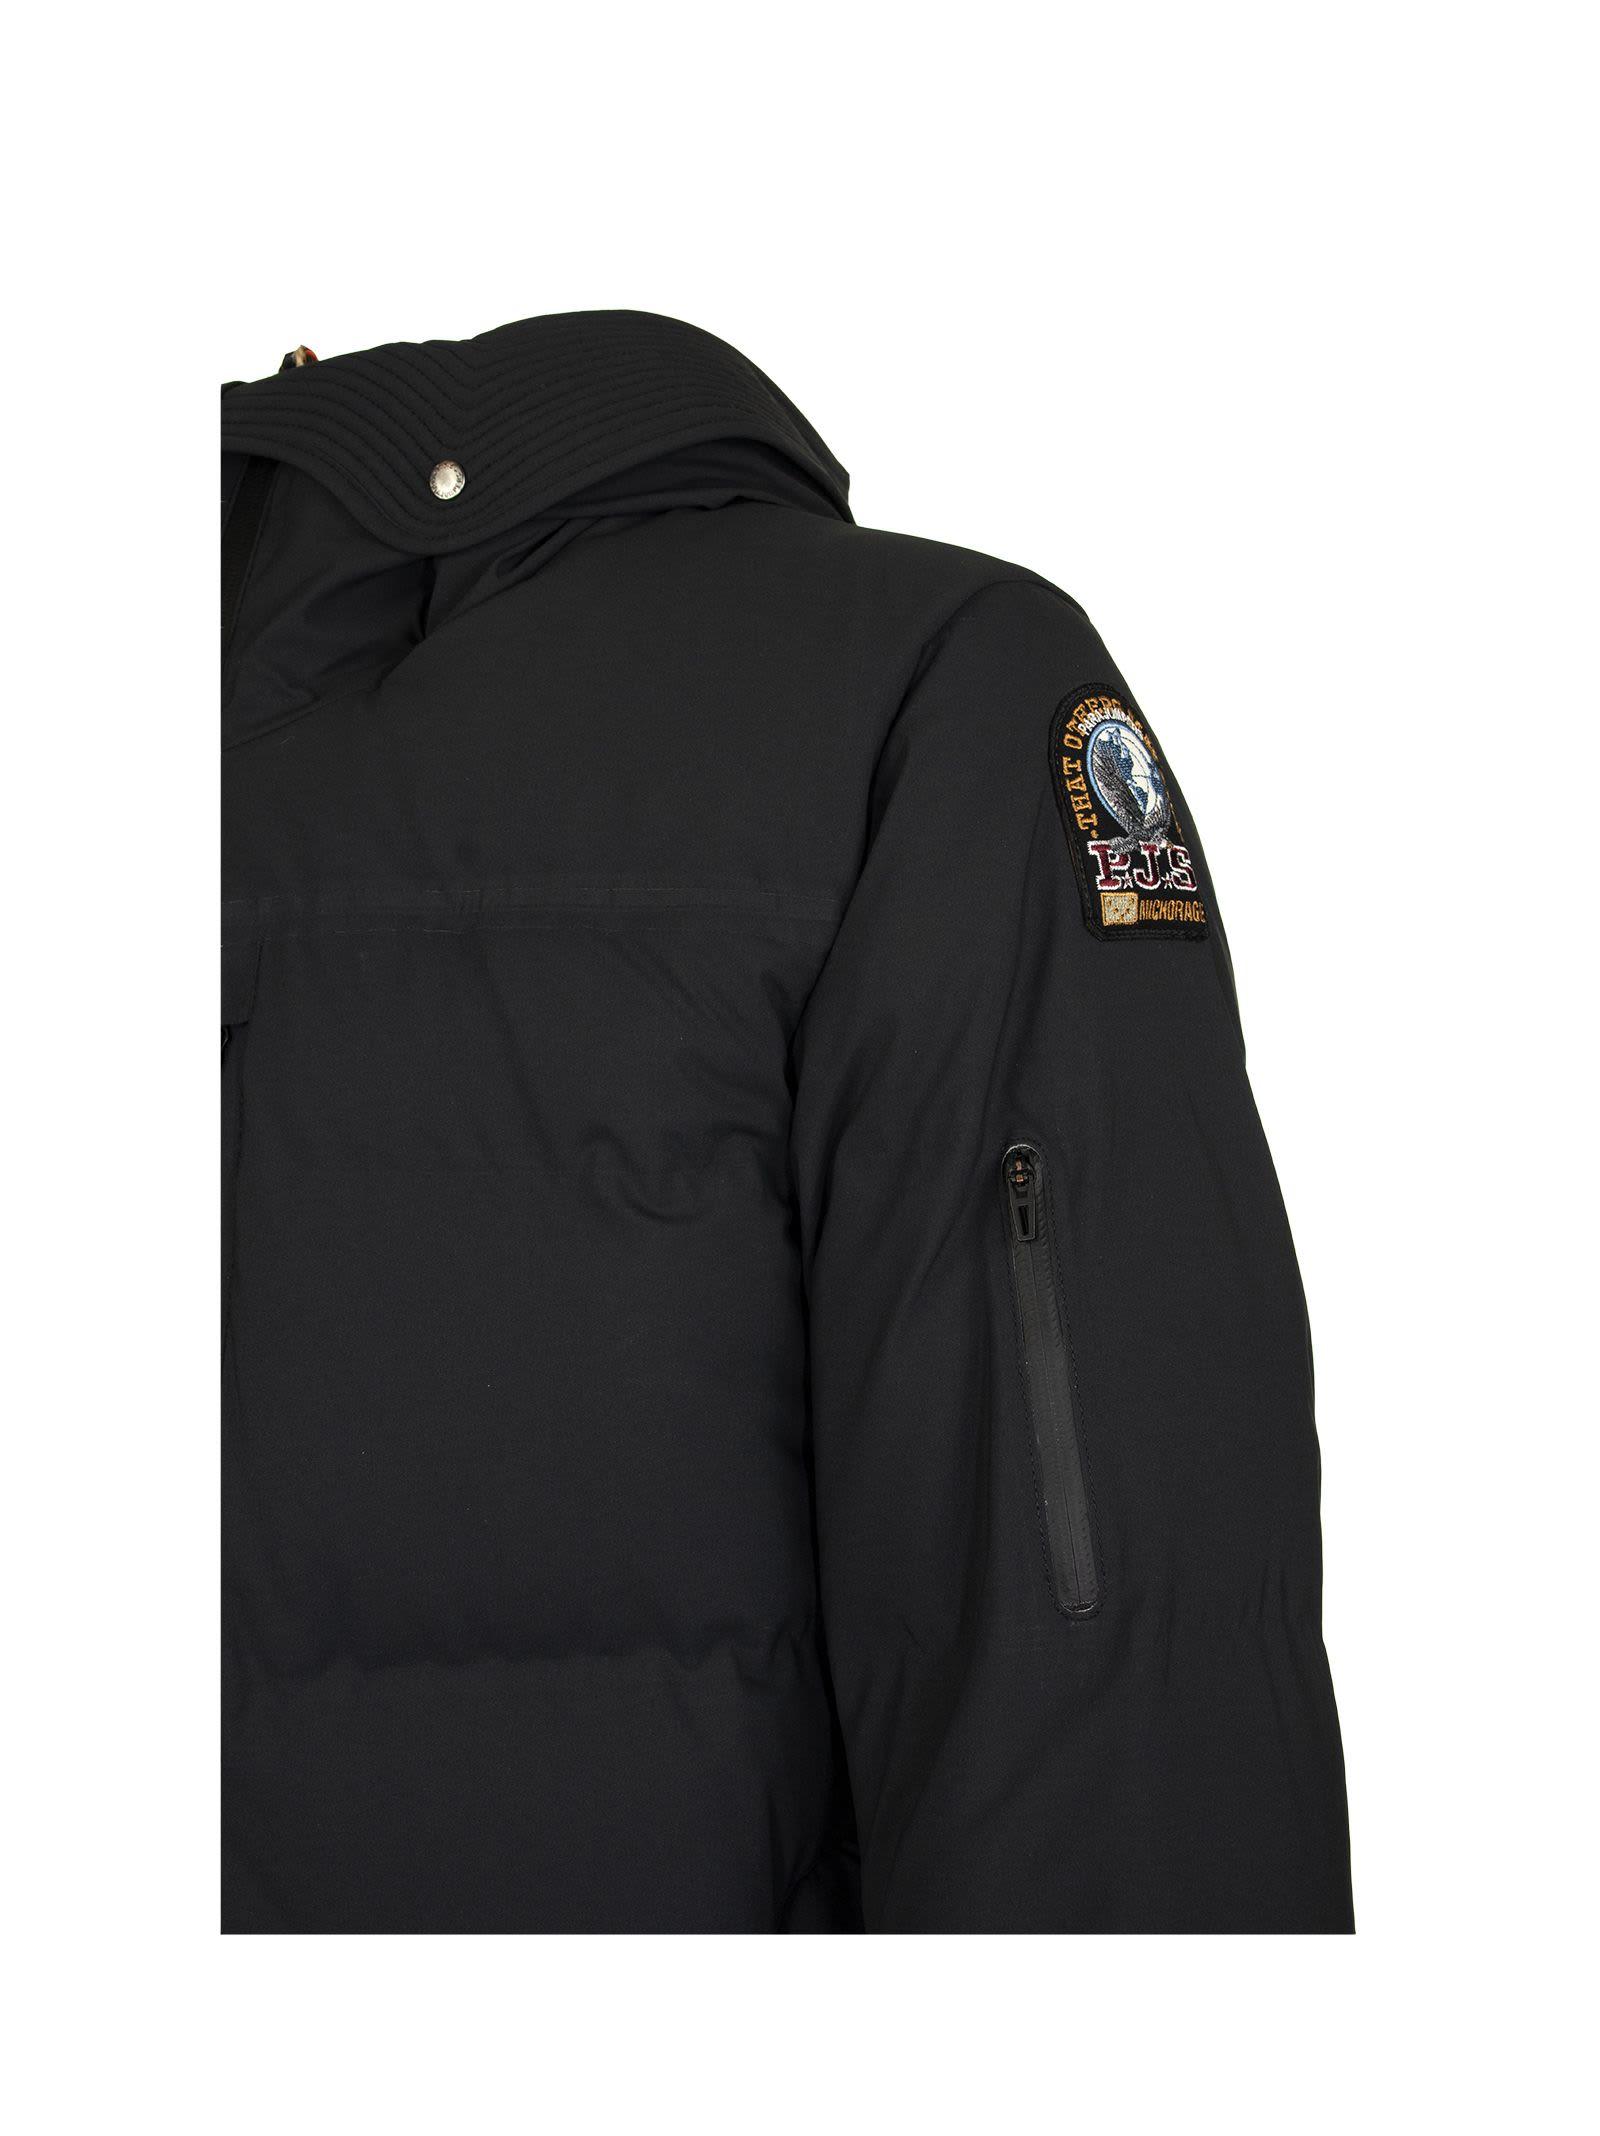 840.00 Mens Parajumpers Right Hand Parka Jacket Black